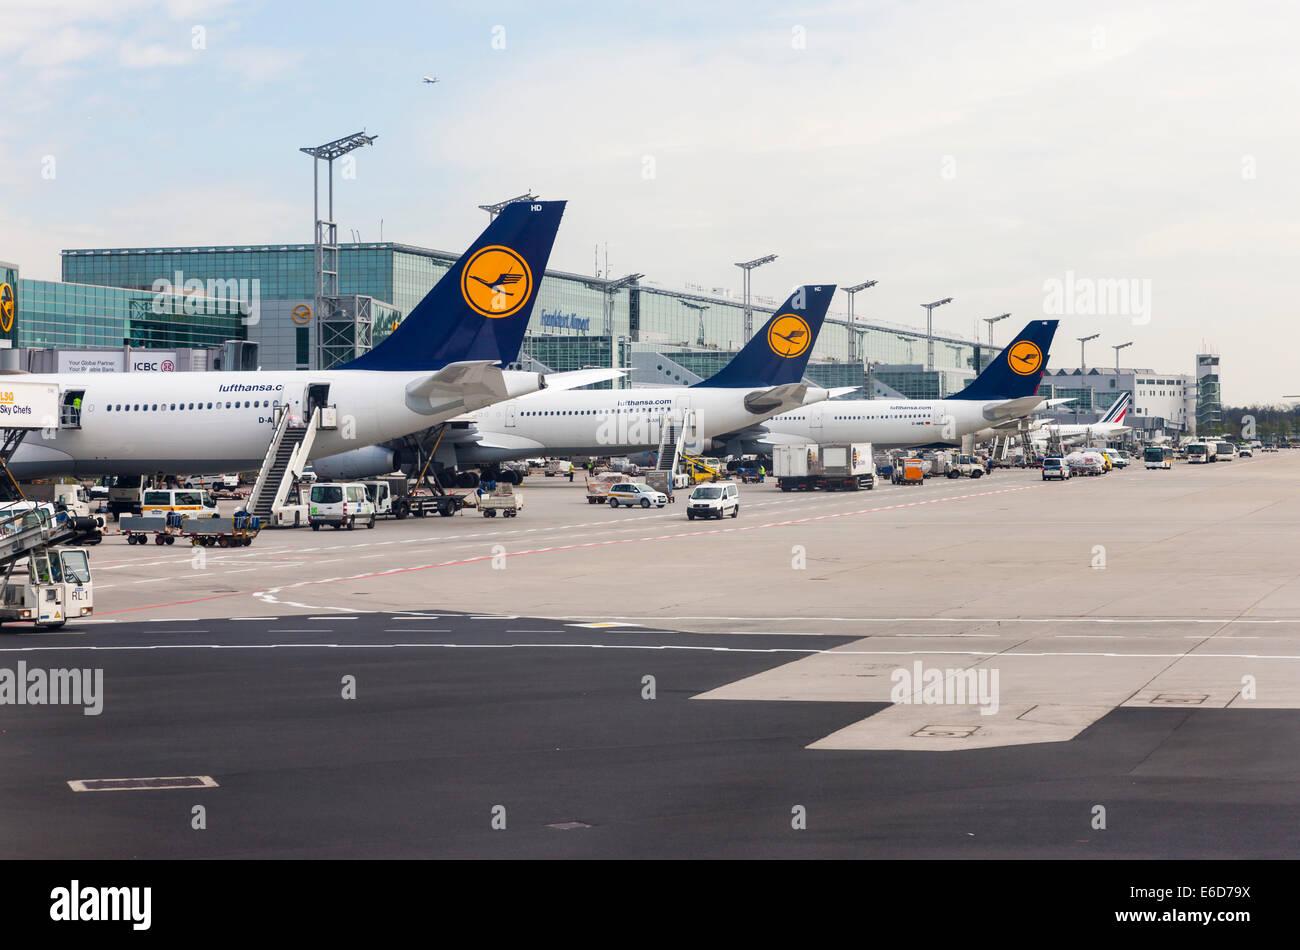 Germany, Hesse, Frankfurt am Main, Airplanes of Lufthansa at passenger terminal - Stock Image